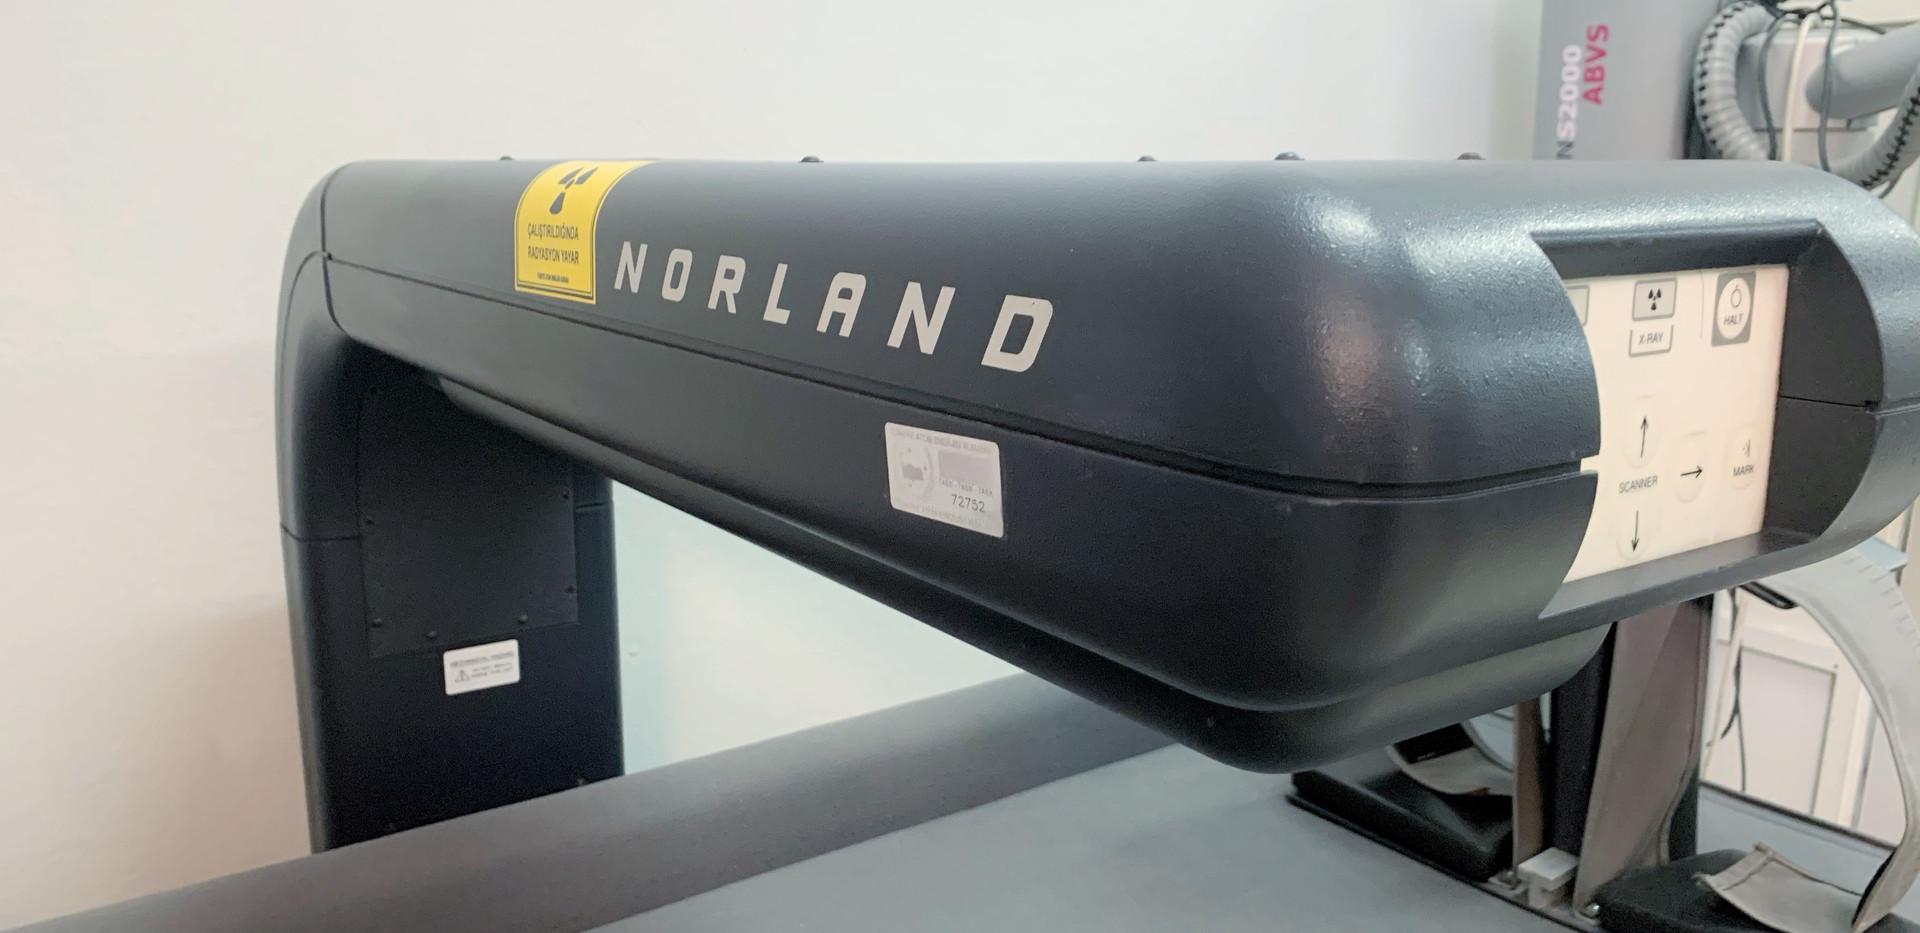 Norland_XR_46_Kemik_Densiometri_Cihazı_